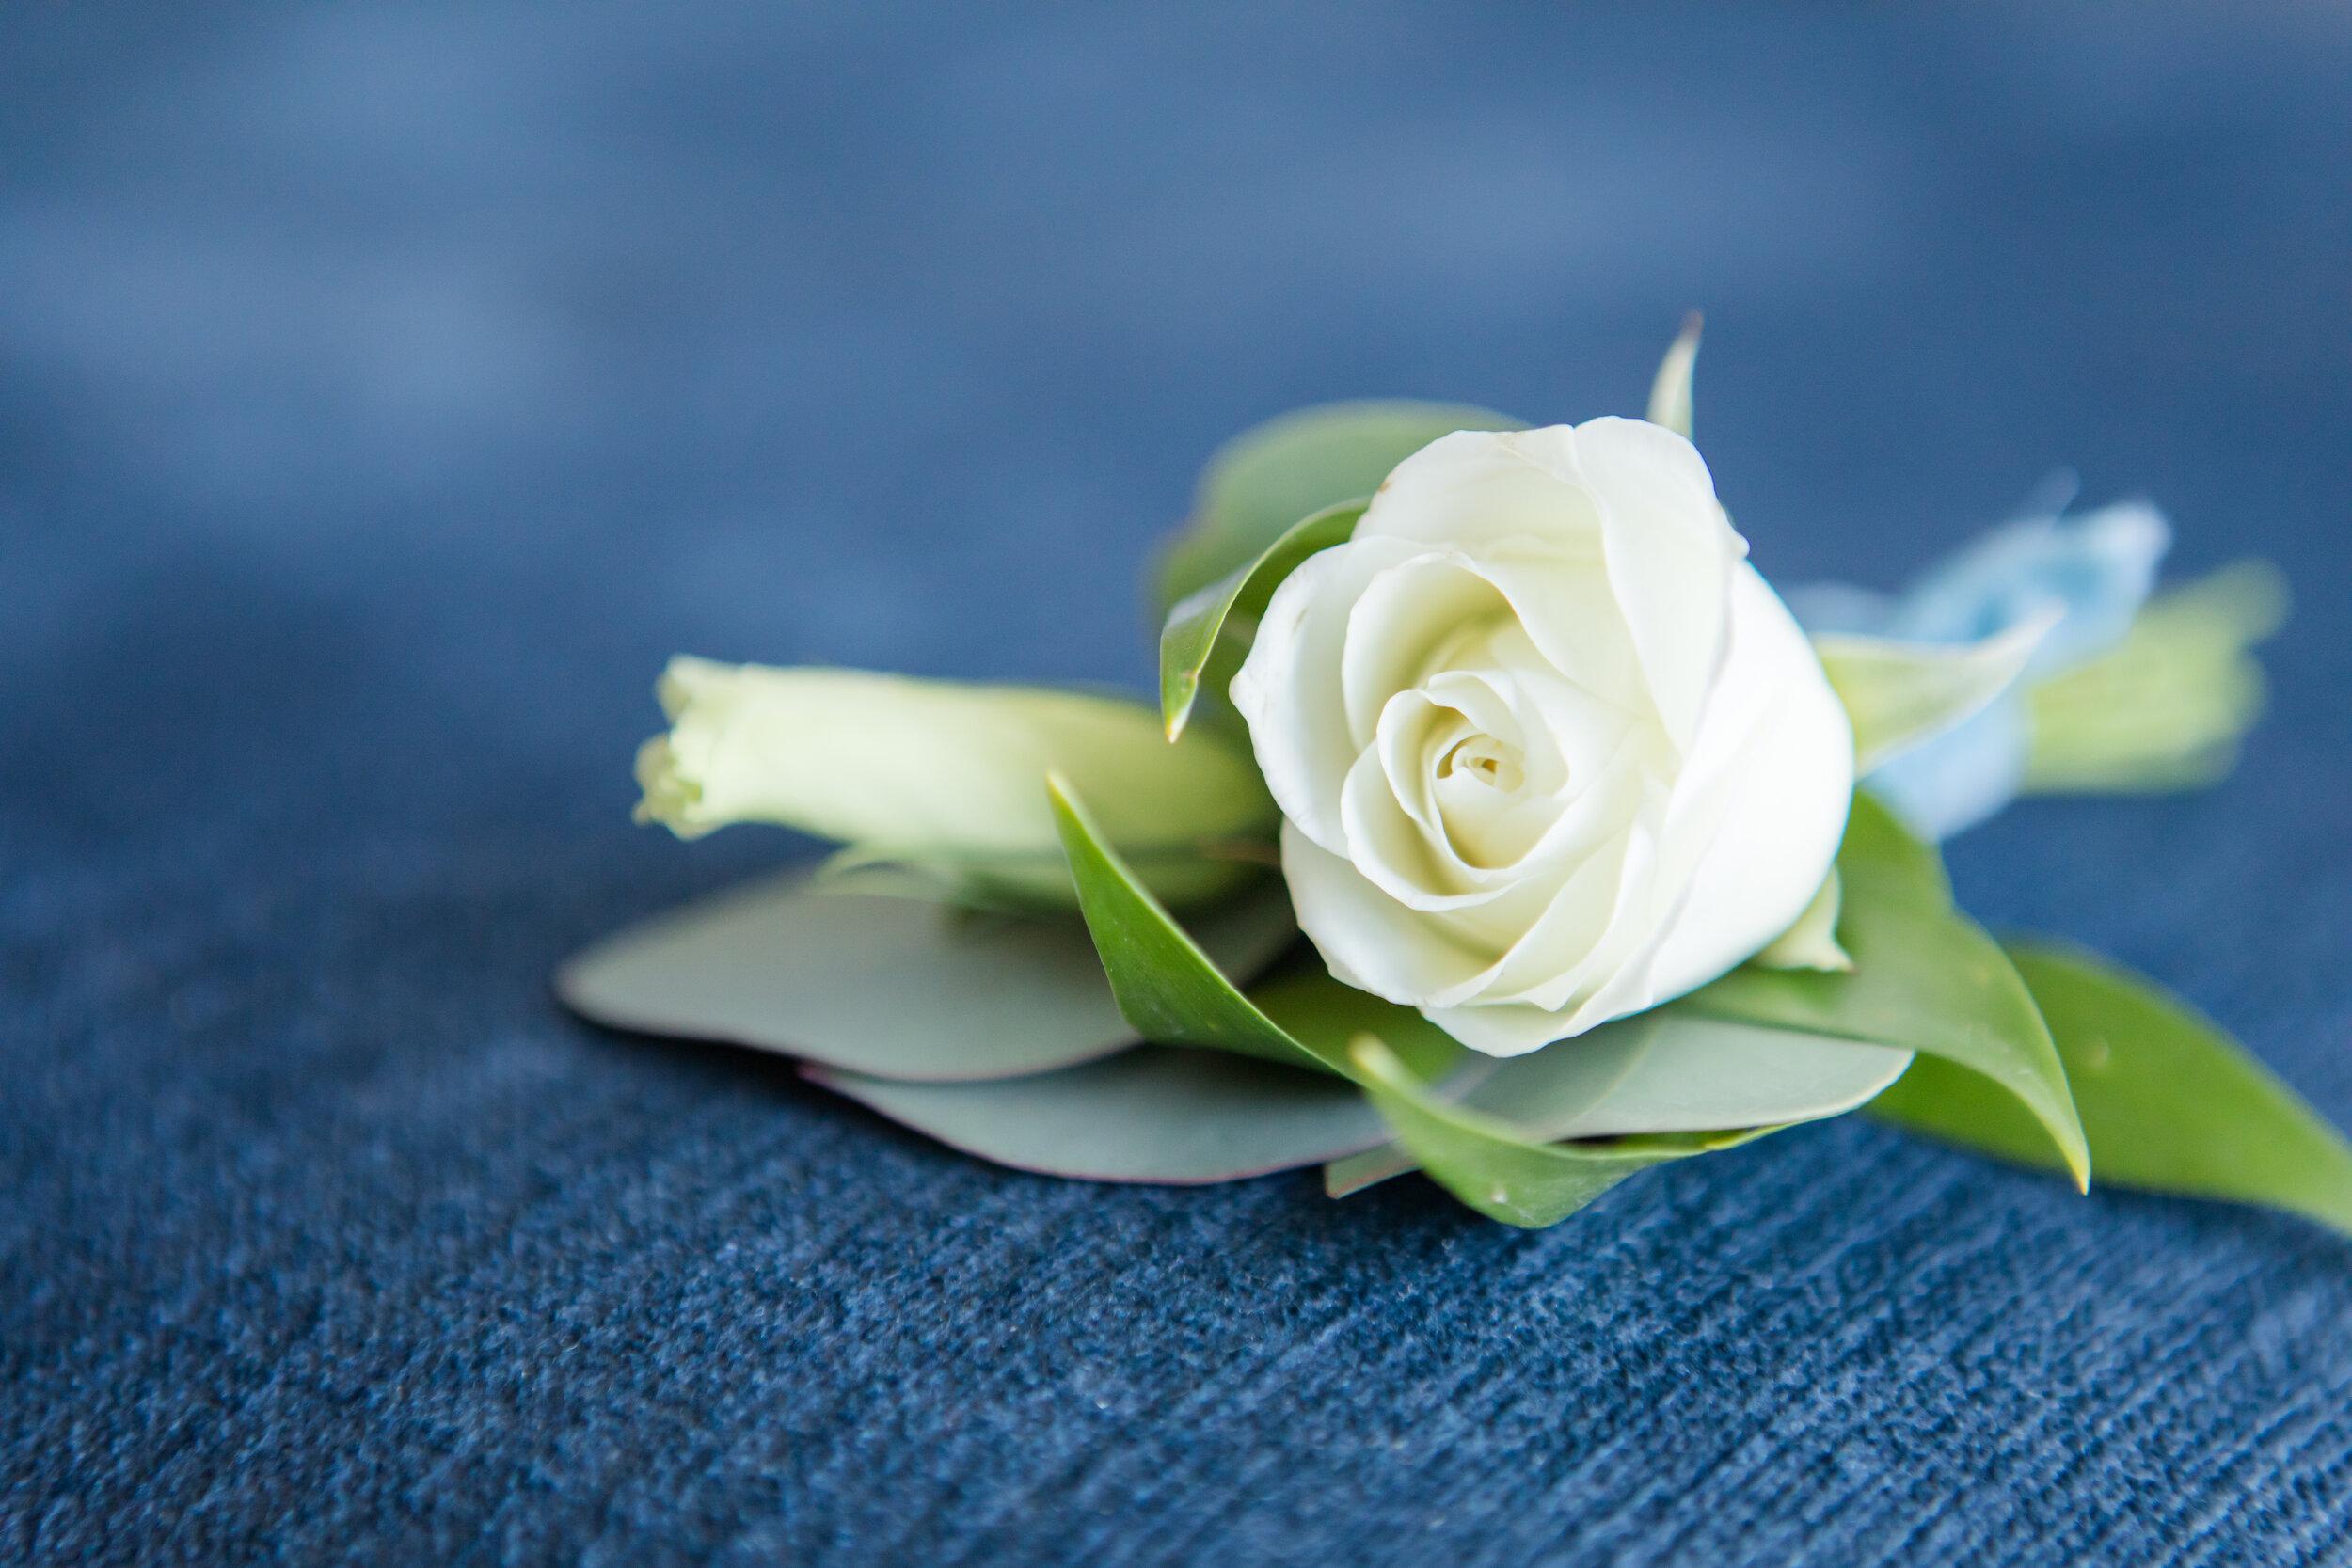 ivory-and-beau-bride-wedding-dresses-bridal-boutique-bridal-shop-savannah-wedding-shop-DGP_SohoSouthCafe_Swanagin-Mullis-12.JPG